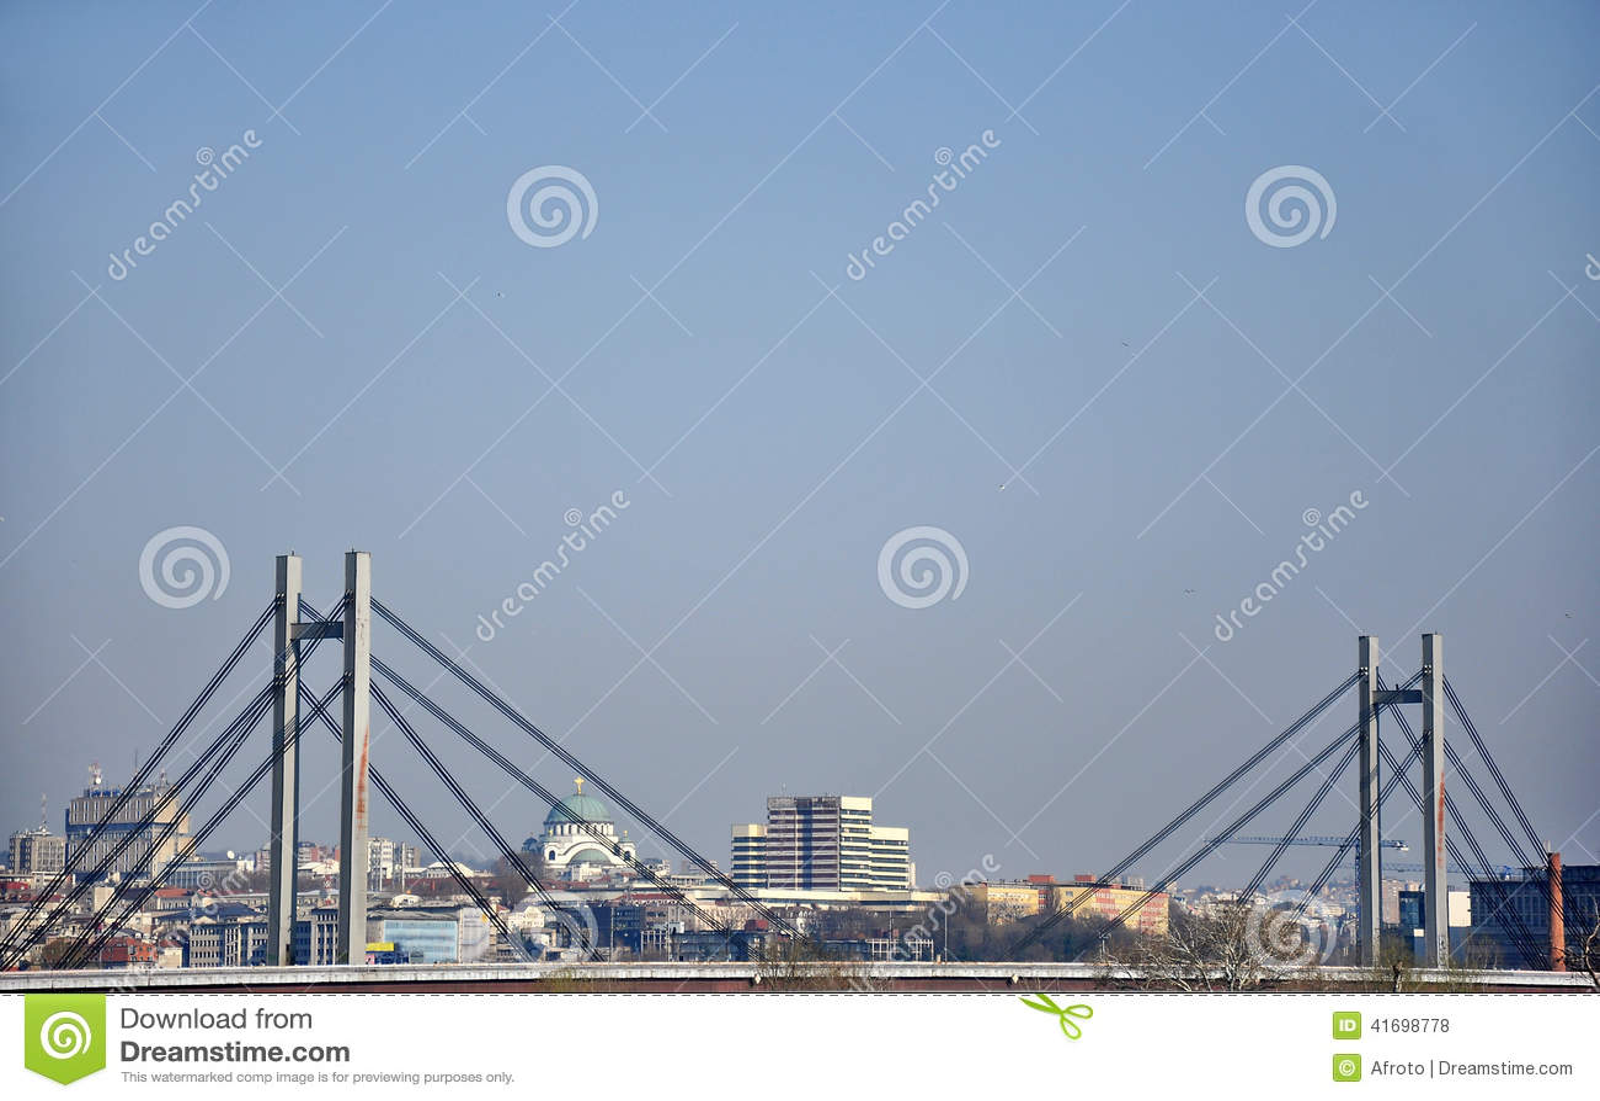 Pont dans la grande ville de Belgrade